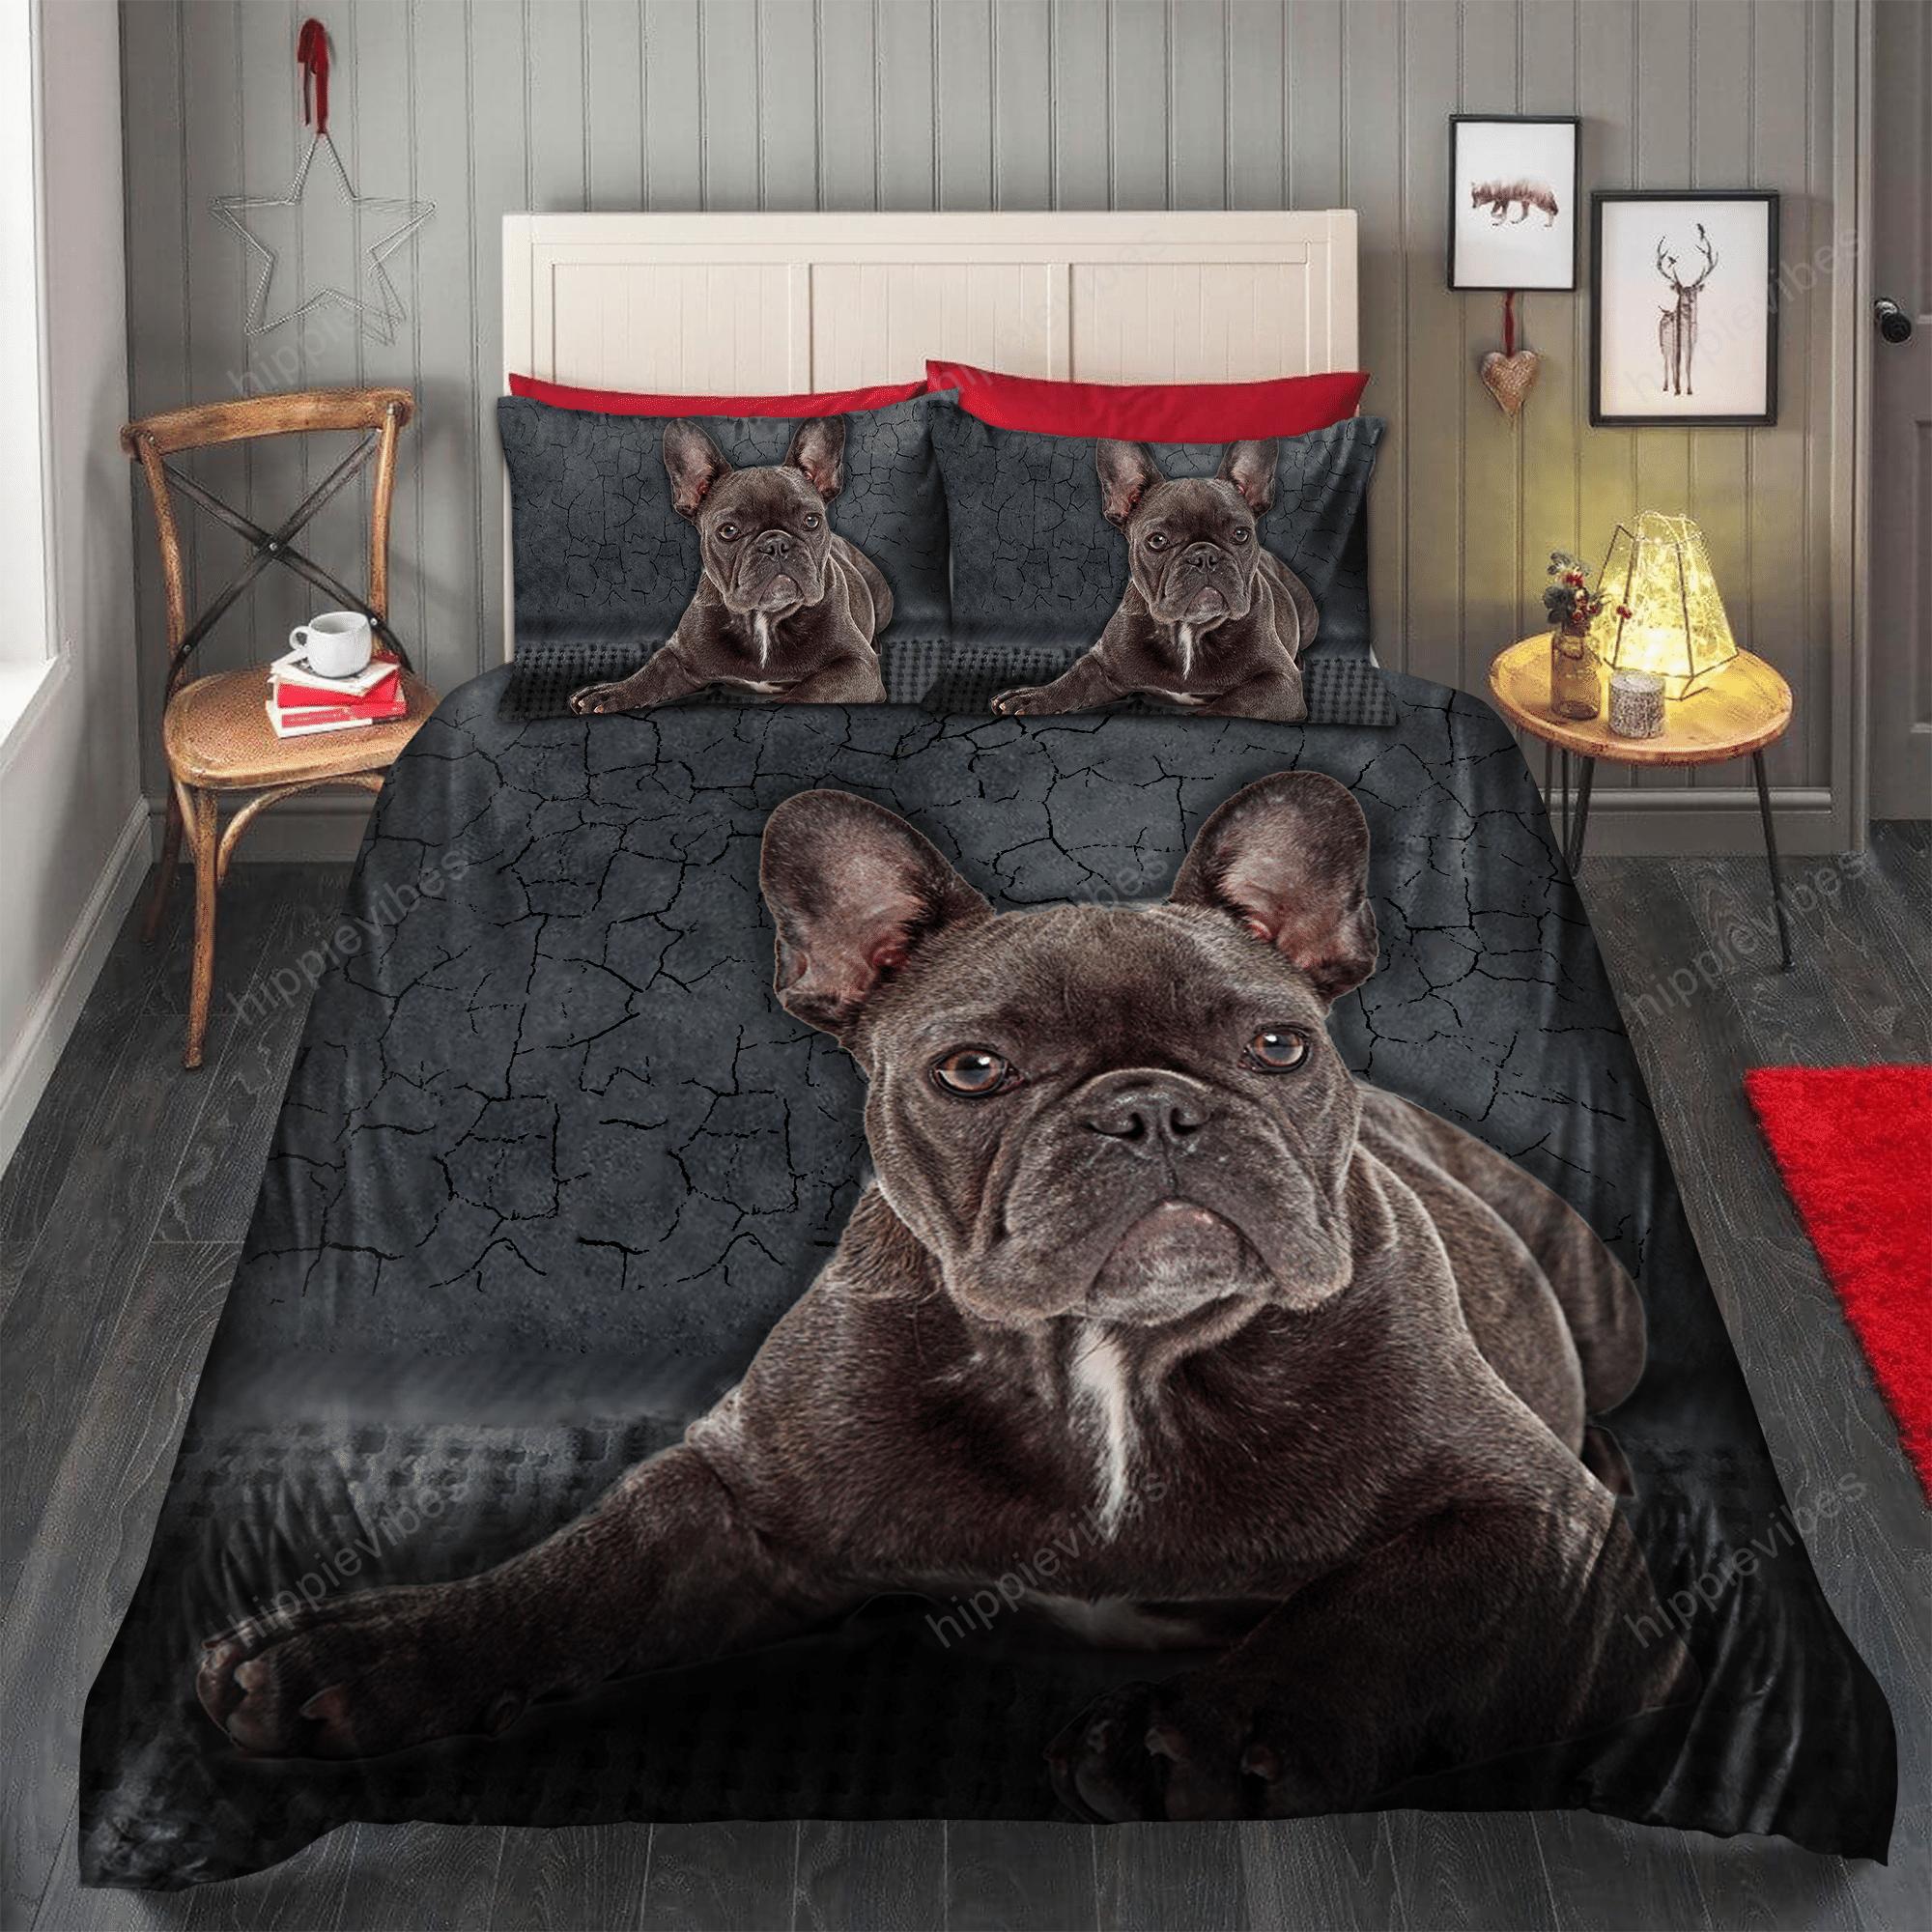 French Bulldog Bedding Set